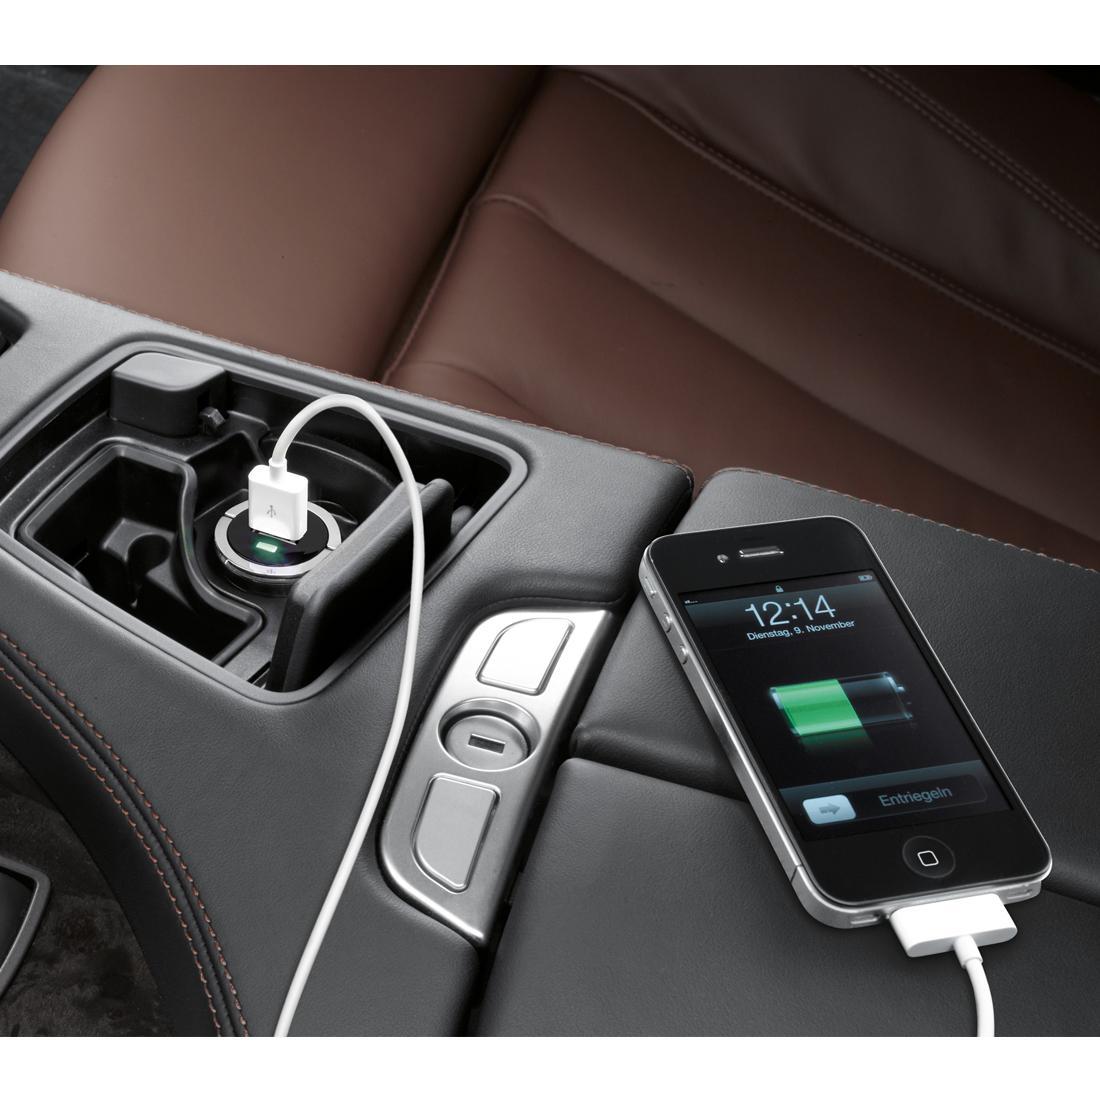 BMW 3 Series 2013 bmw x5 accessories ShopBMWUSA.com: BMW USB CHARGER